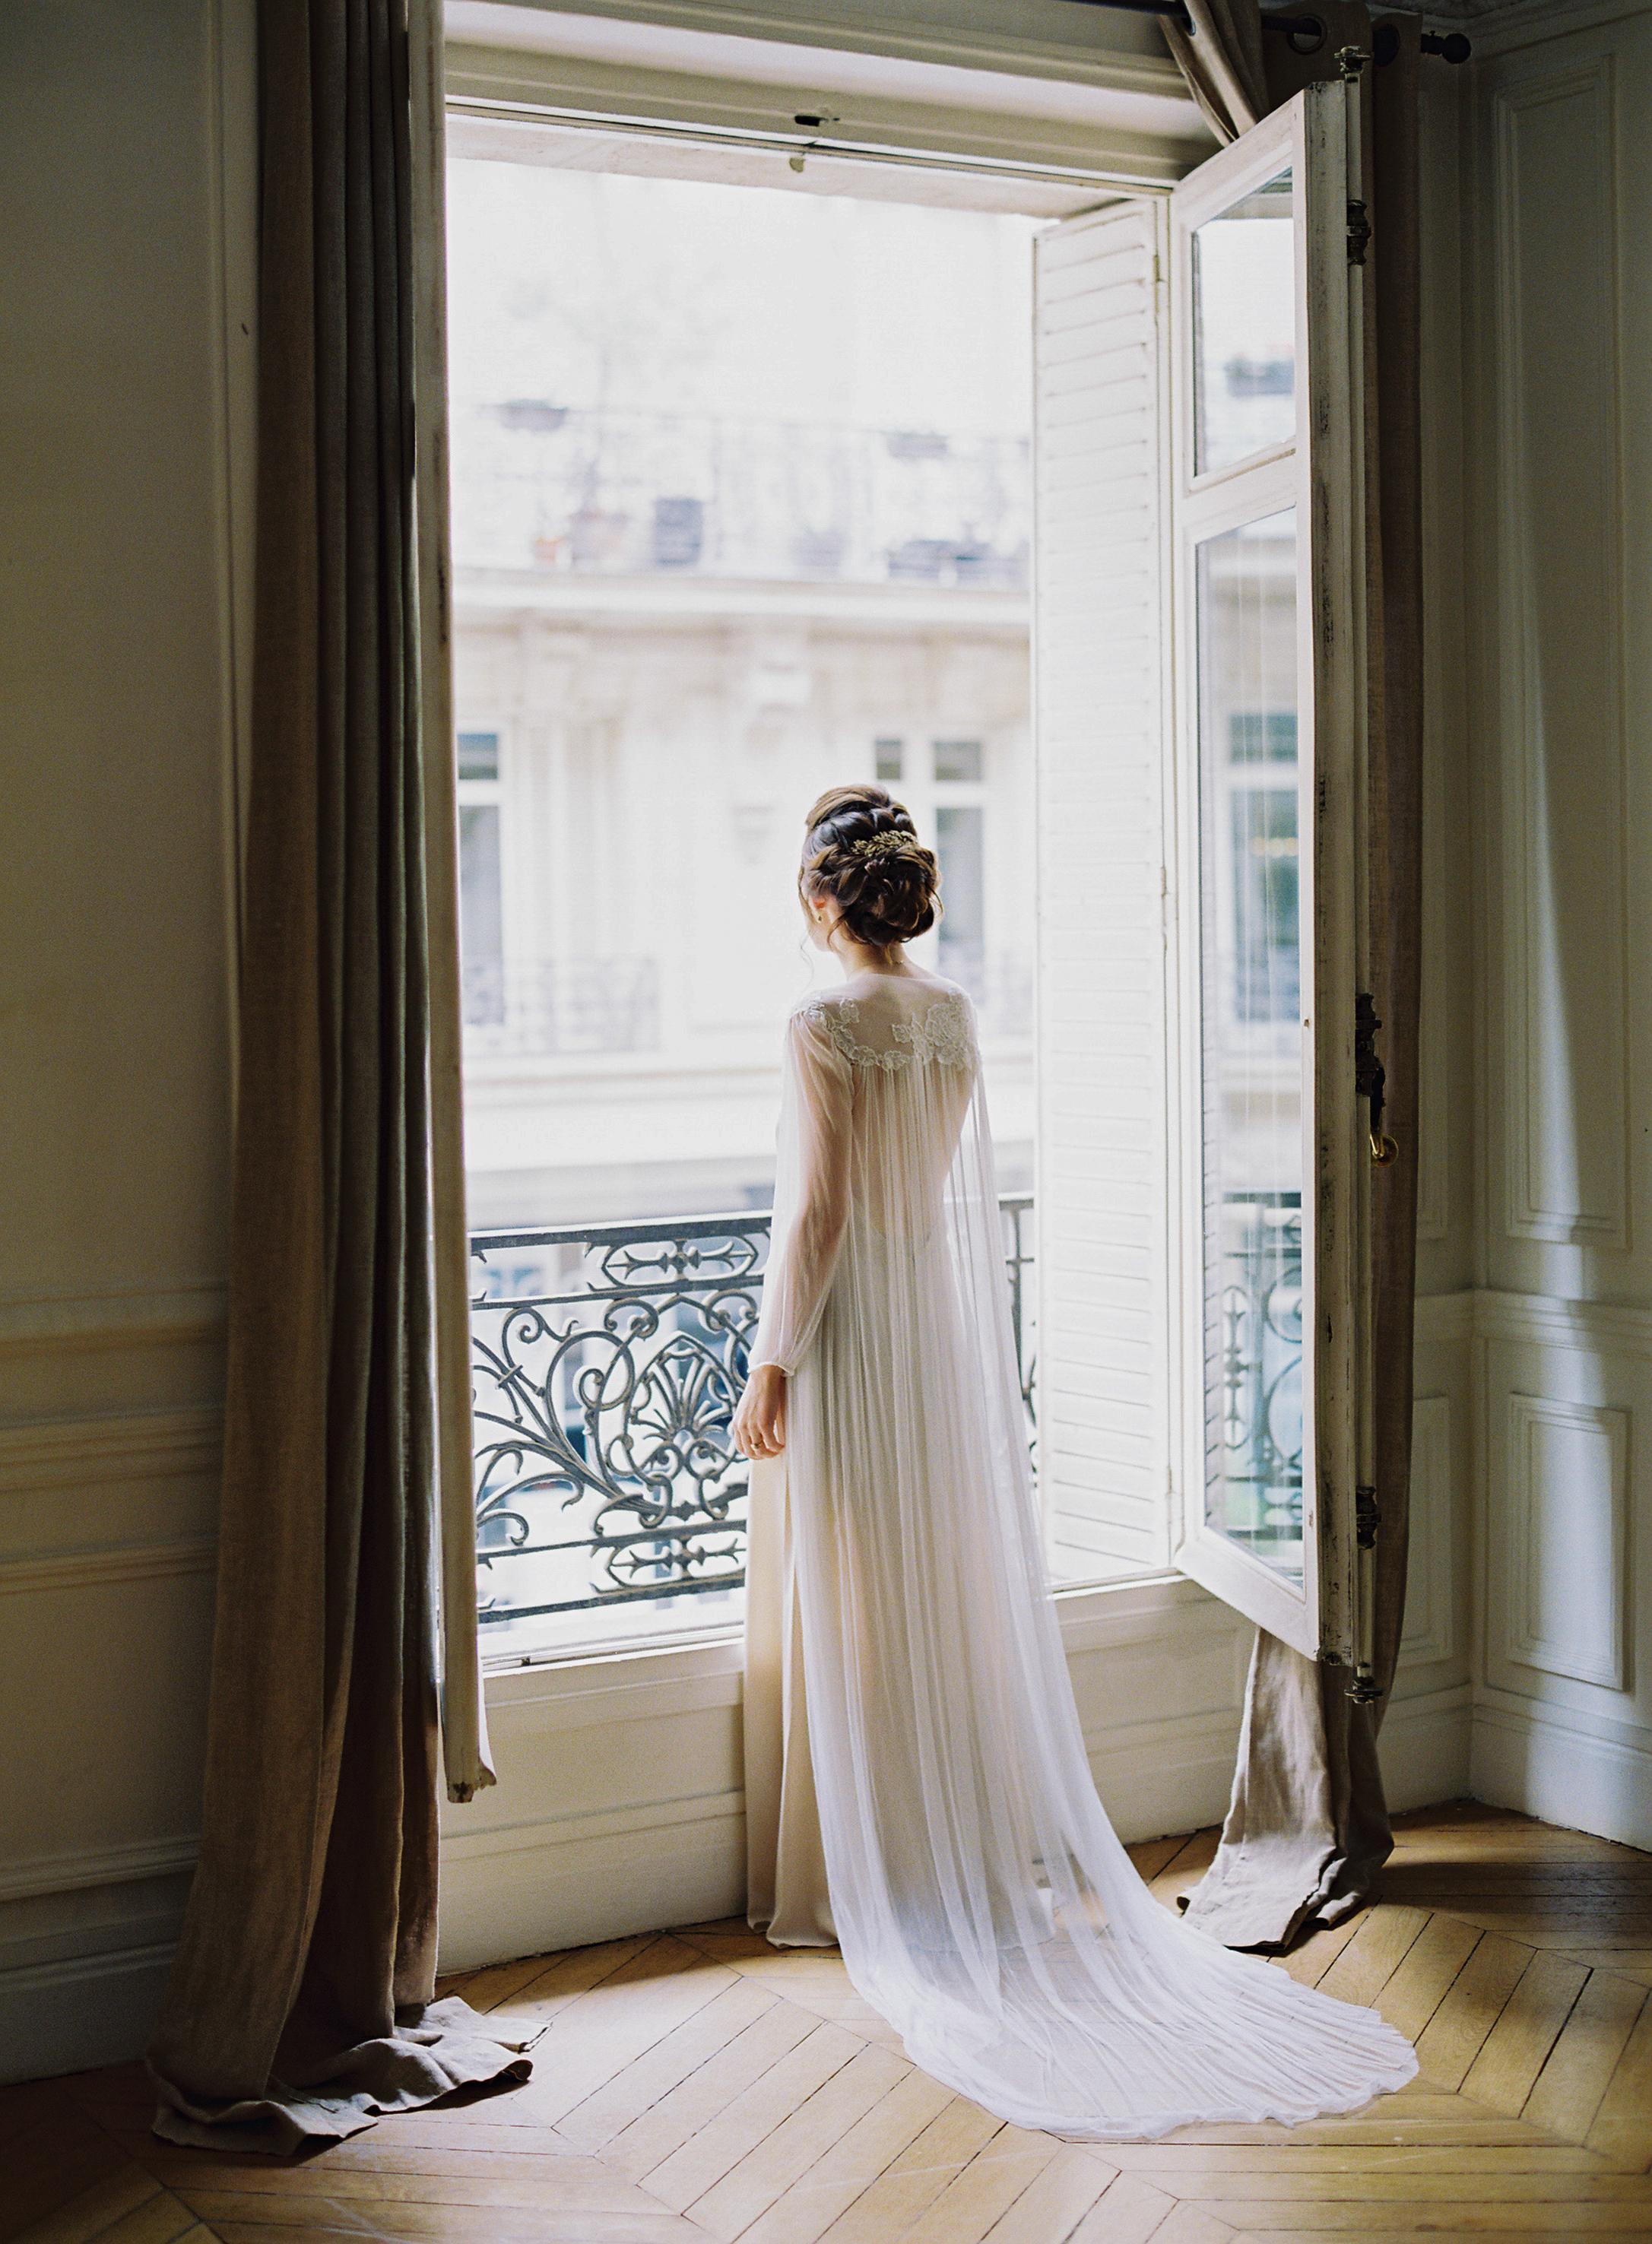 Paris Wedding-Carrie King photographer-1.jpg